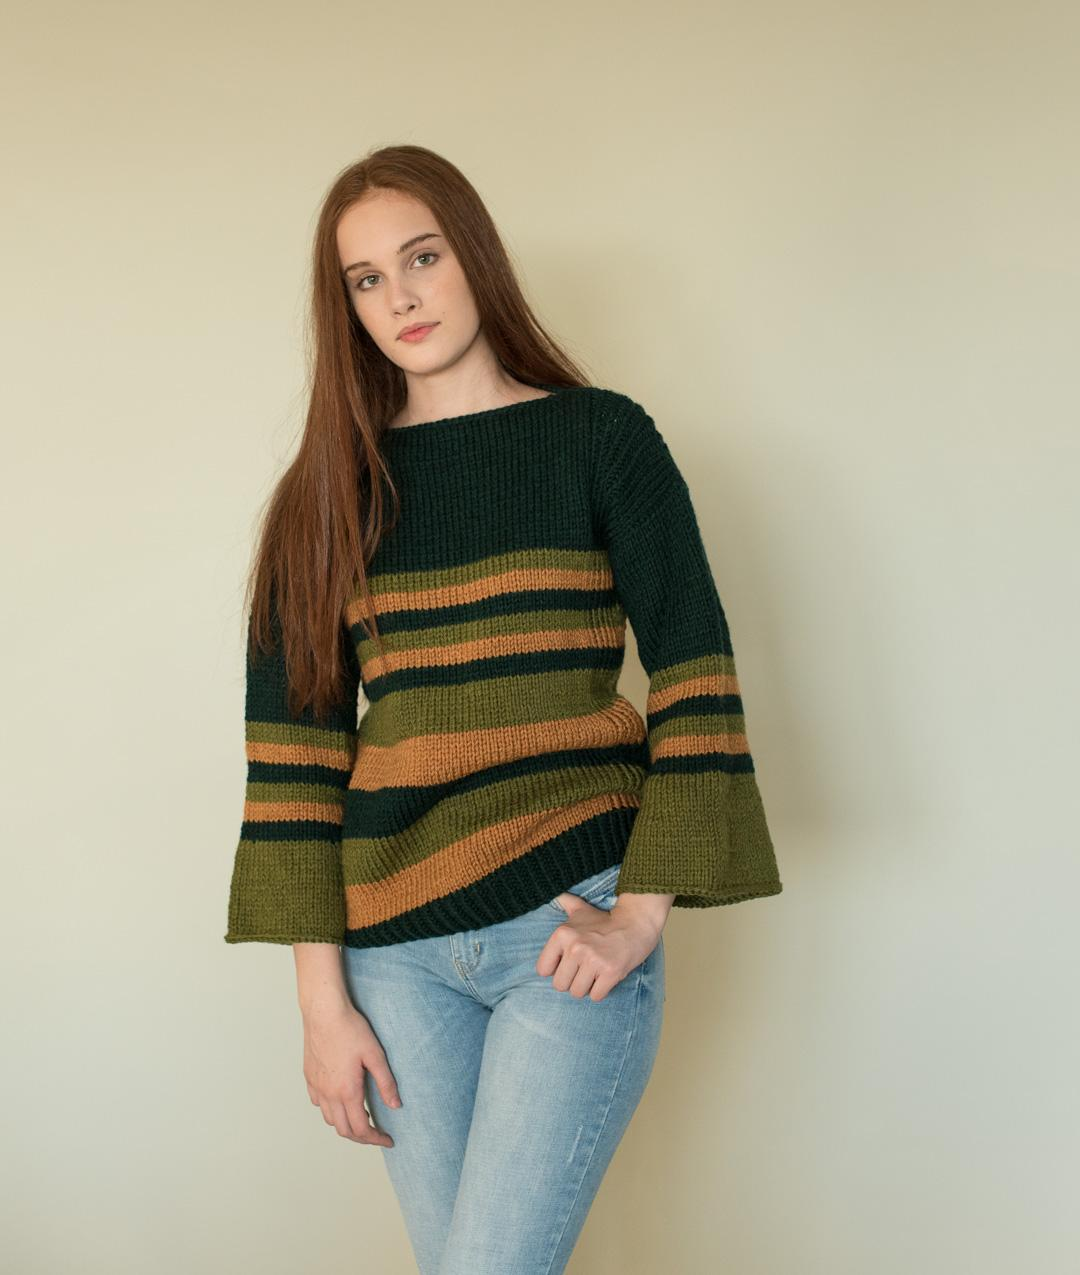 Maglie e Top - Lana - Maine Sweater - 1